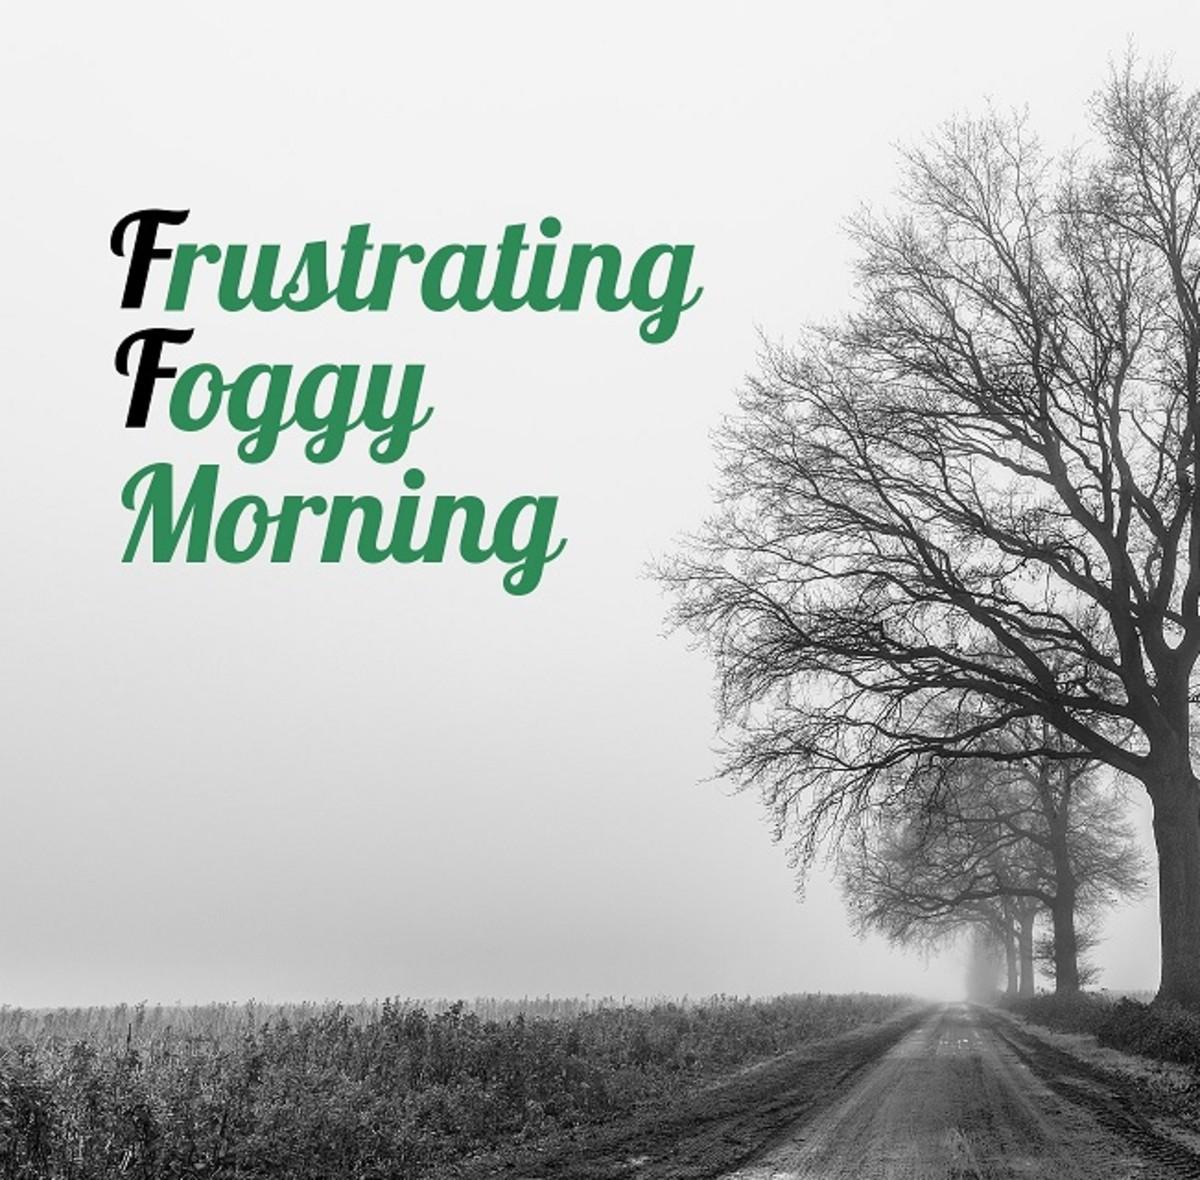 Frustrating Foggy Morning